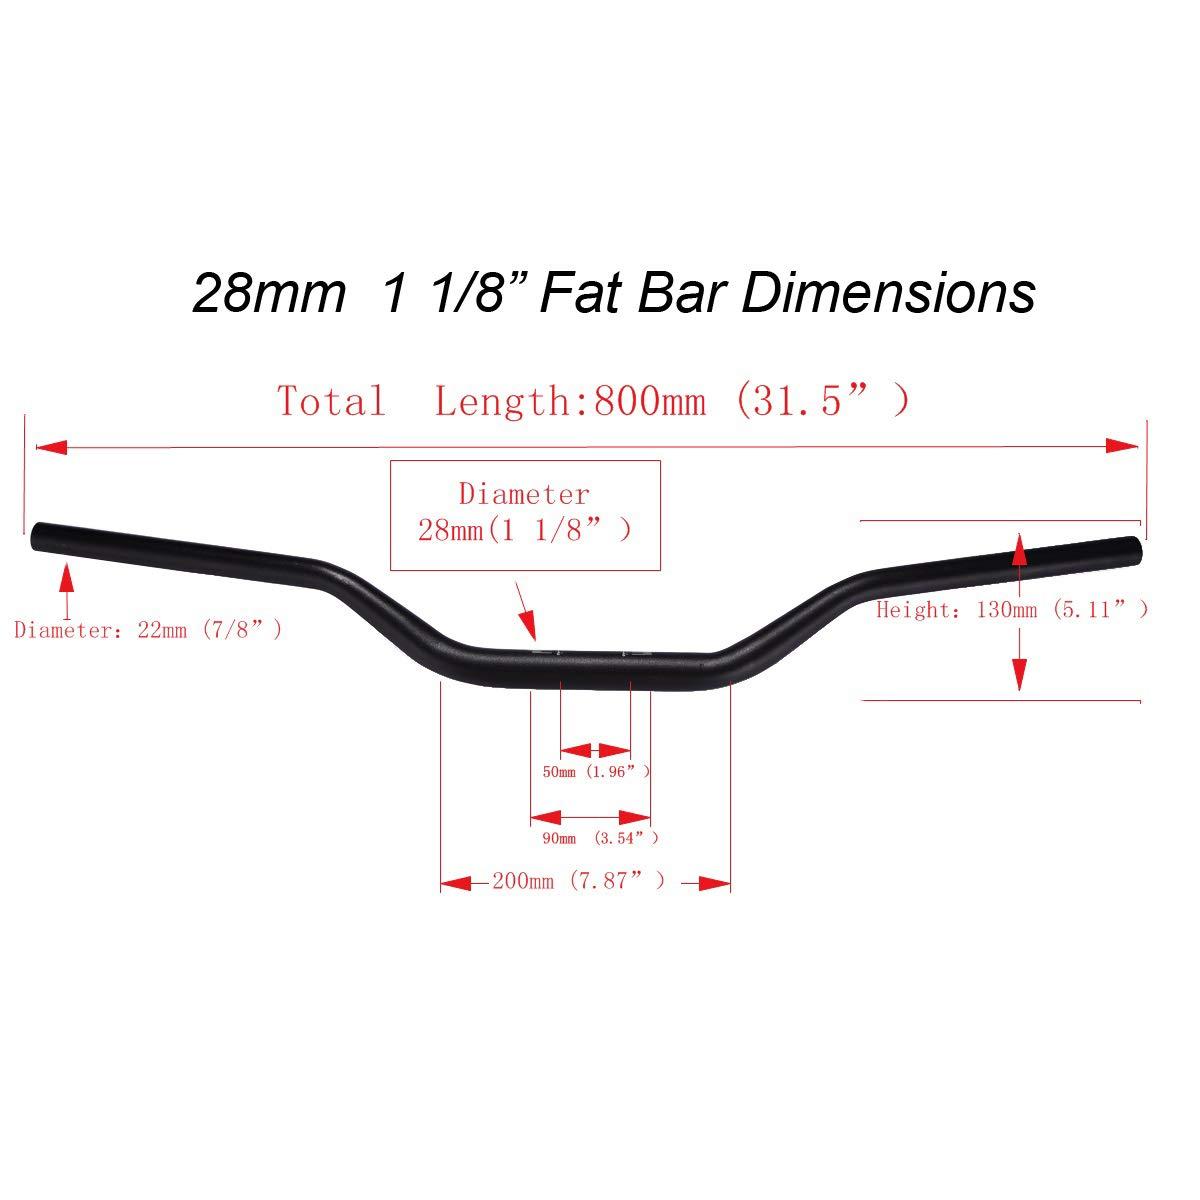 Il wingsmoto 28/mm 1/ /1//8/Fat Manubrio Manubrio di moto per Dirt Pit Bike CRF CR YZ WR KLX RM RMZ RMX Drz